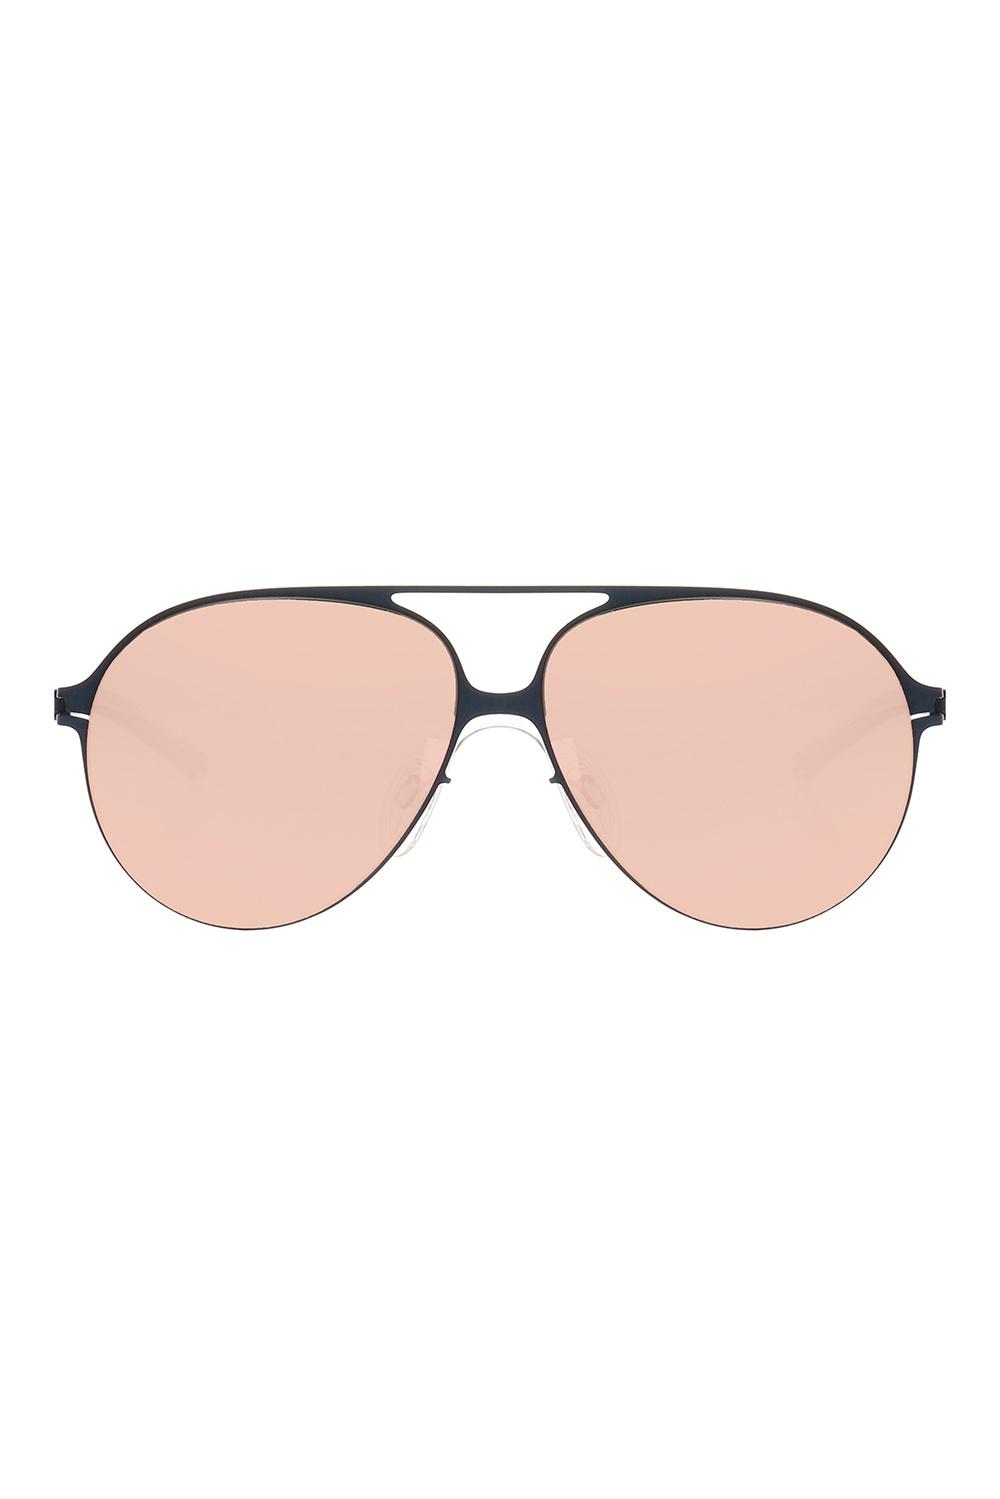 Mykita 'Hansi' sunglasses